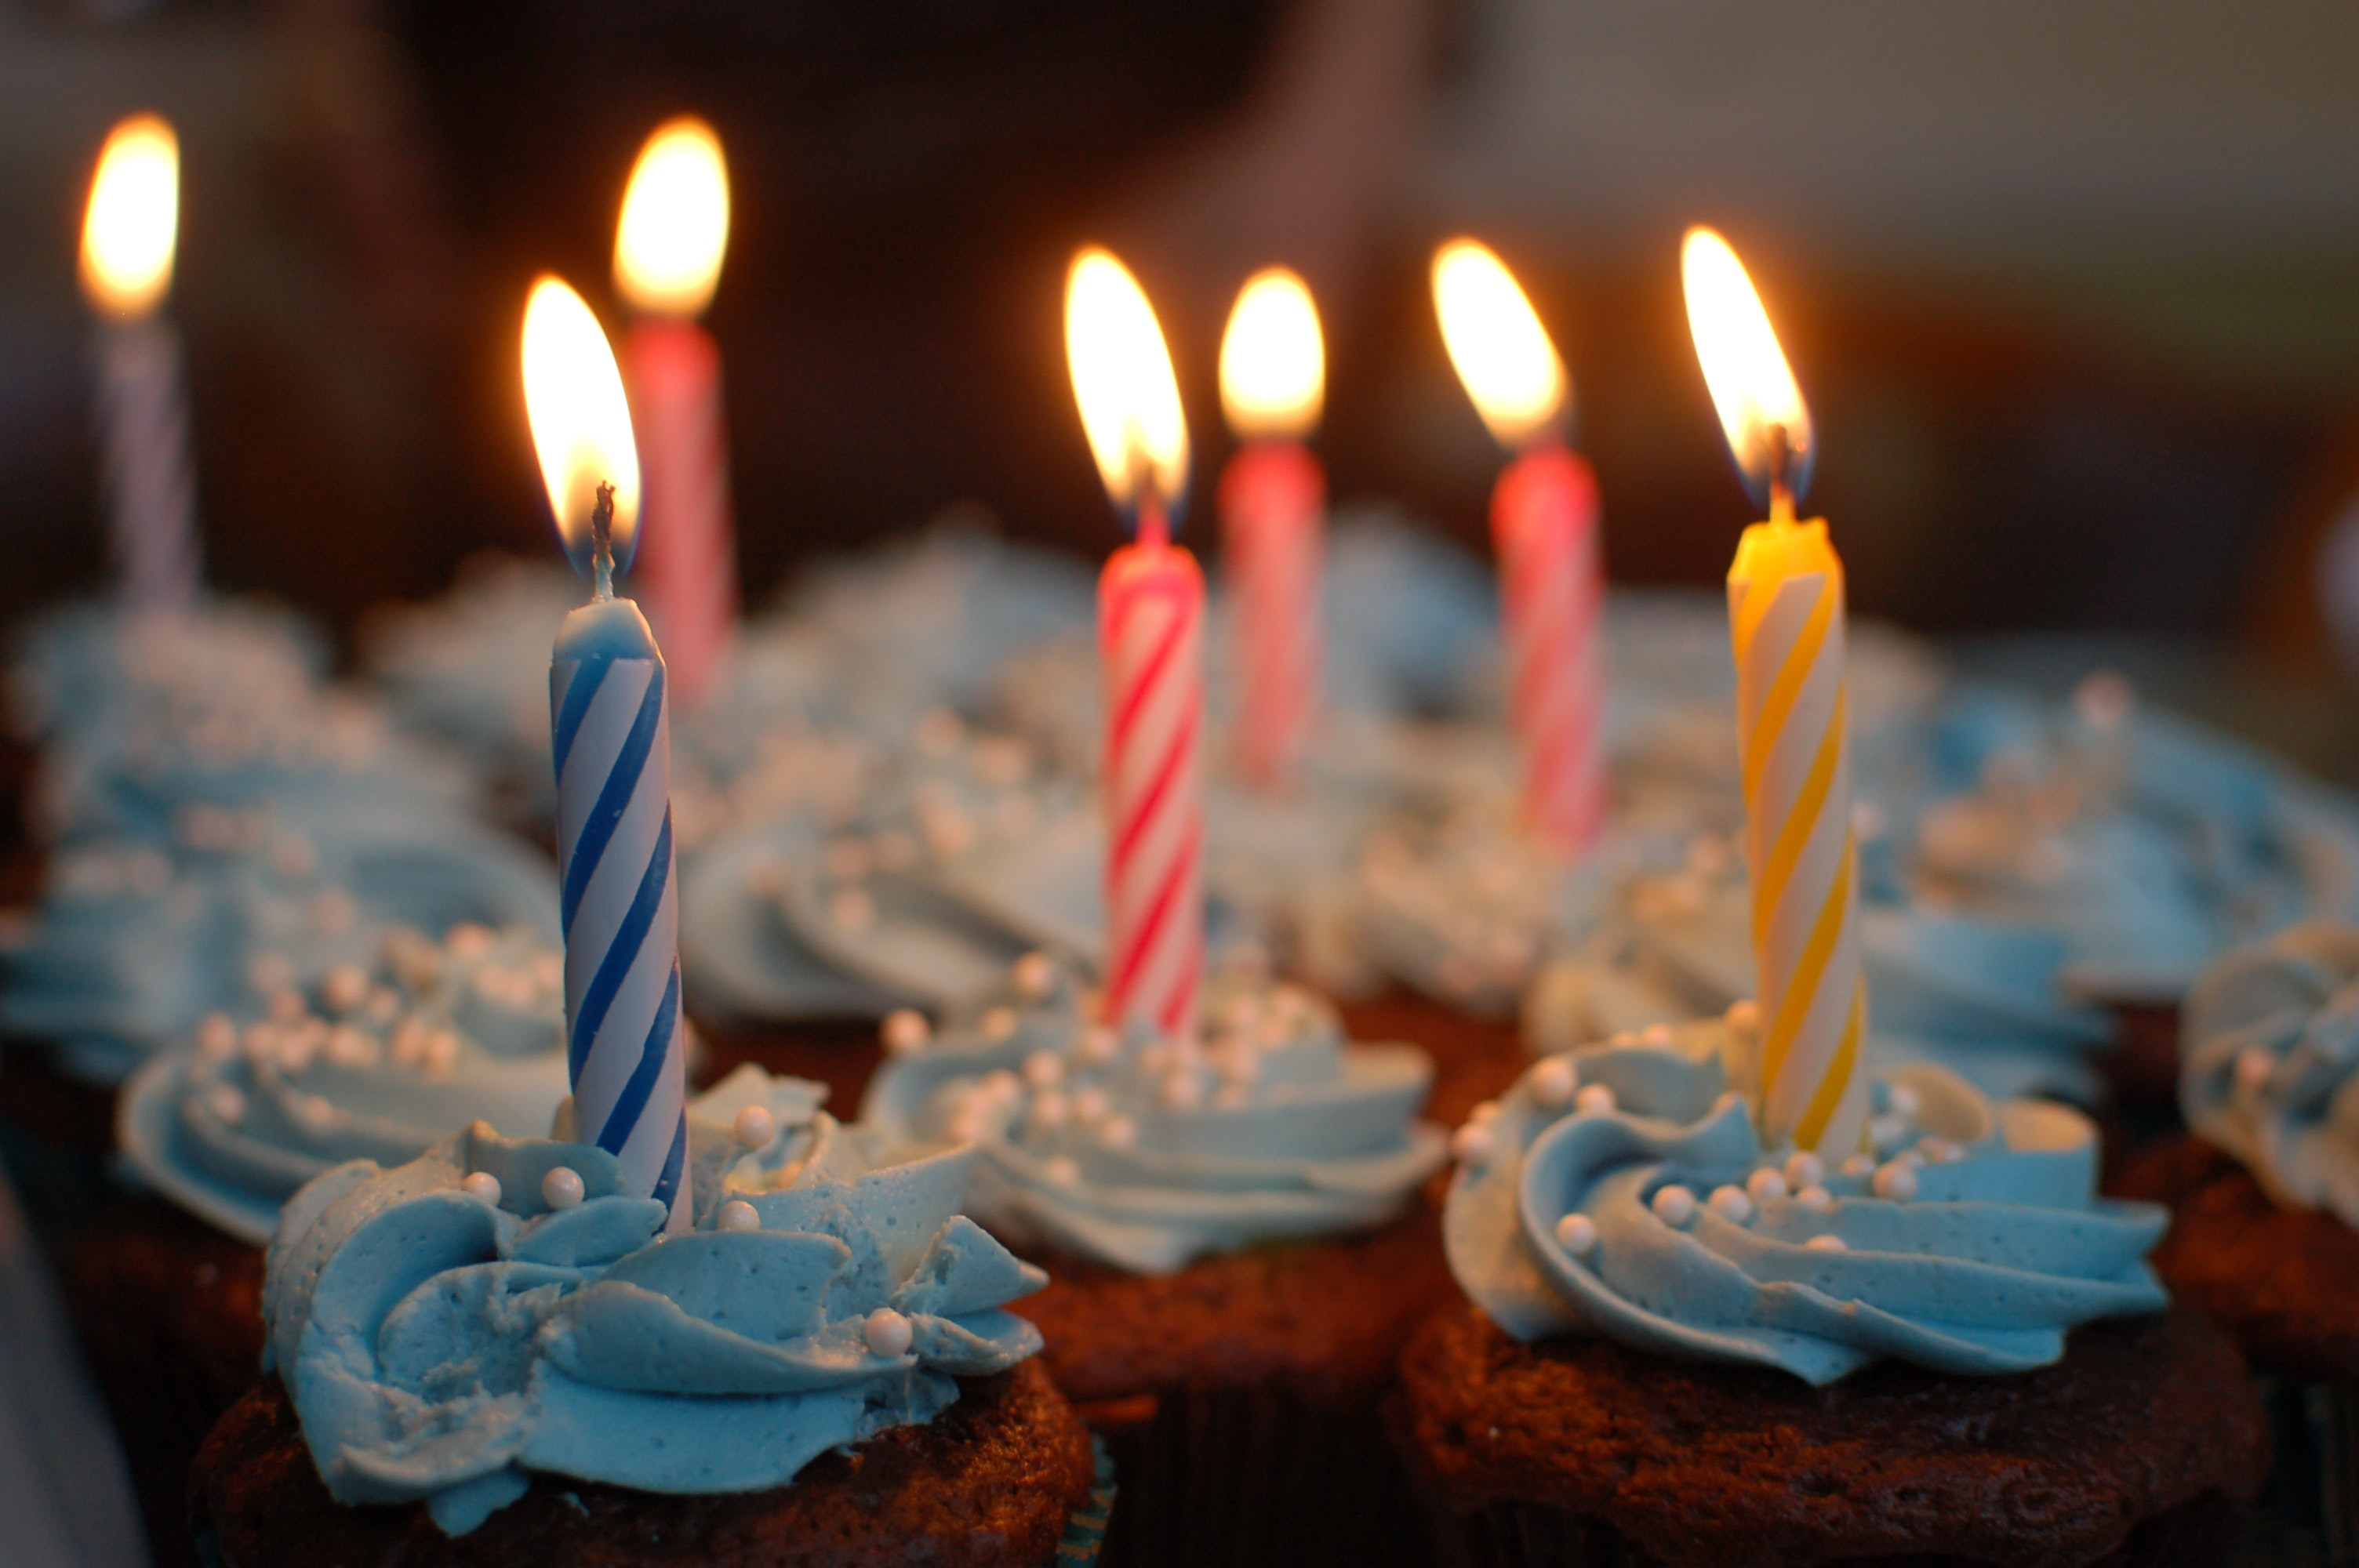 500+ Amazing Birthday Cake Photos · Pexels · Free Stock Photos